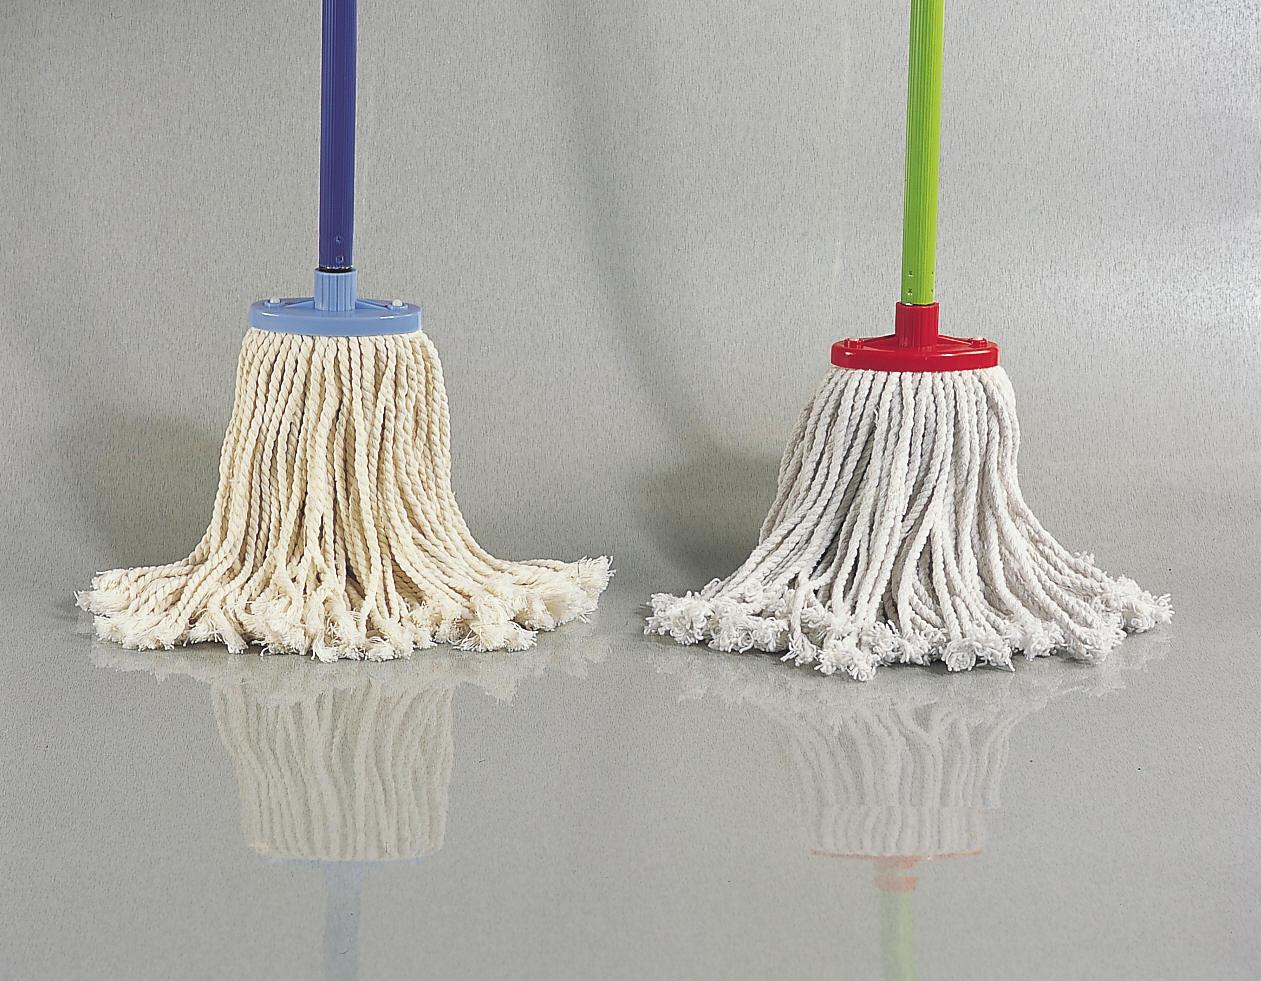 Mop with cotton bristle